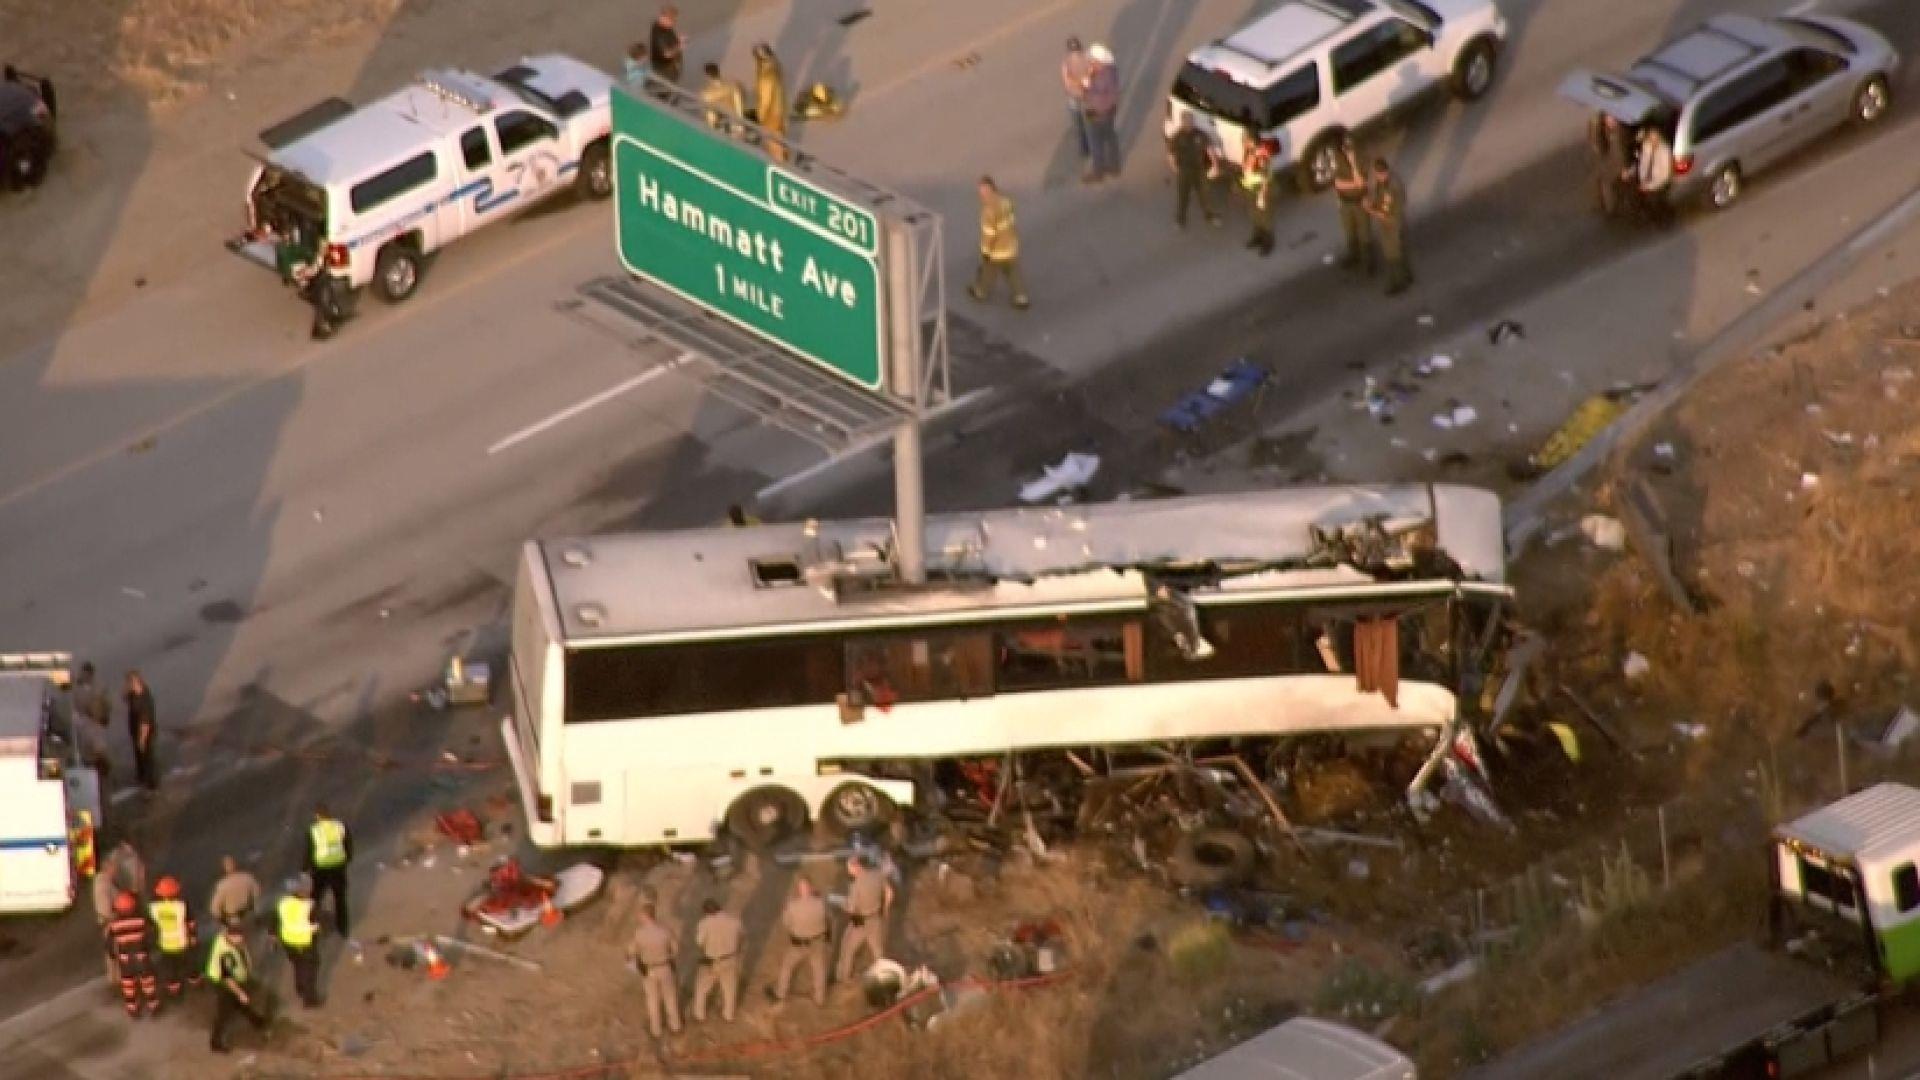 Bus Crash in Merced, California, Kills At Least 5